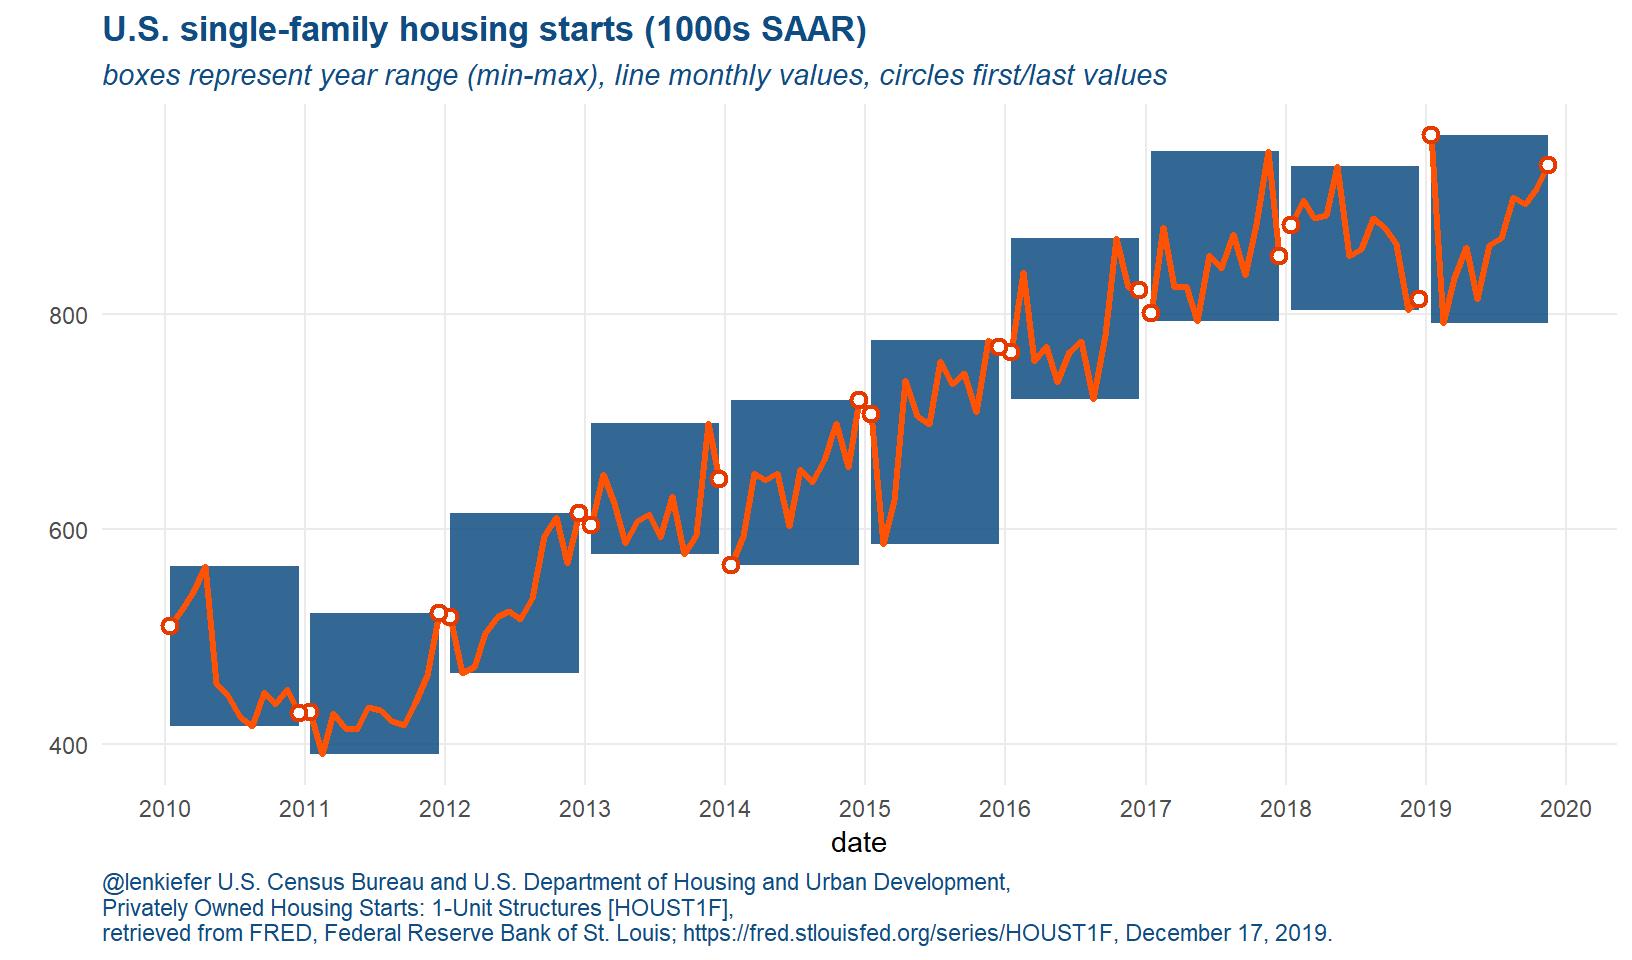 U.S. Single-family housing starts